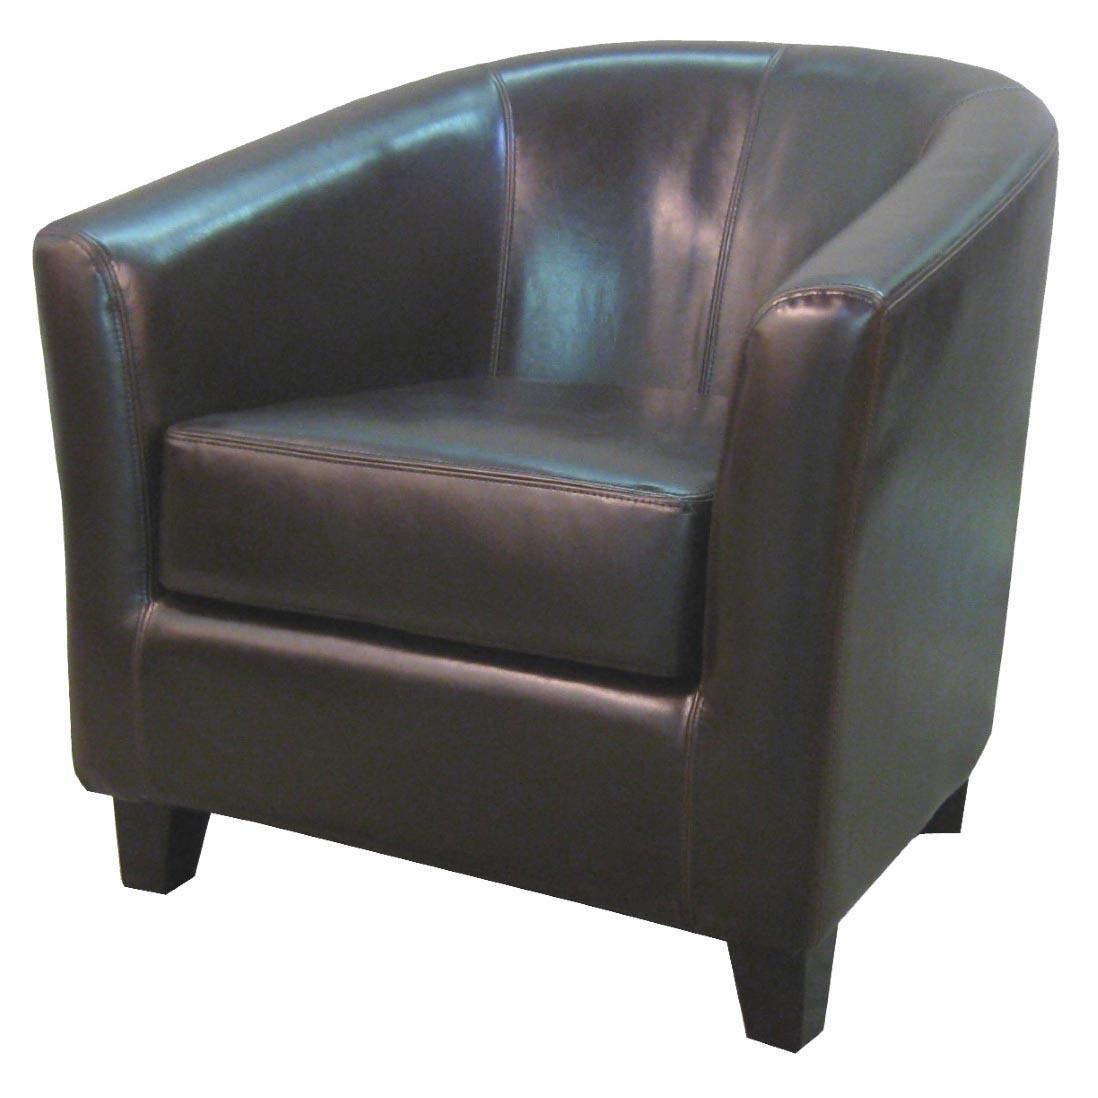 Remarkable Hayden Bonded Leather Tub Chair Brown Creativecarmelina Interior Chair Design Creativecarmelinacom